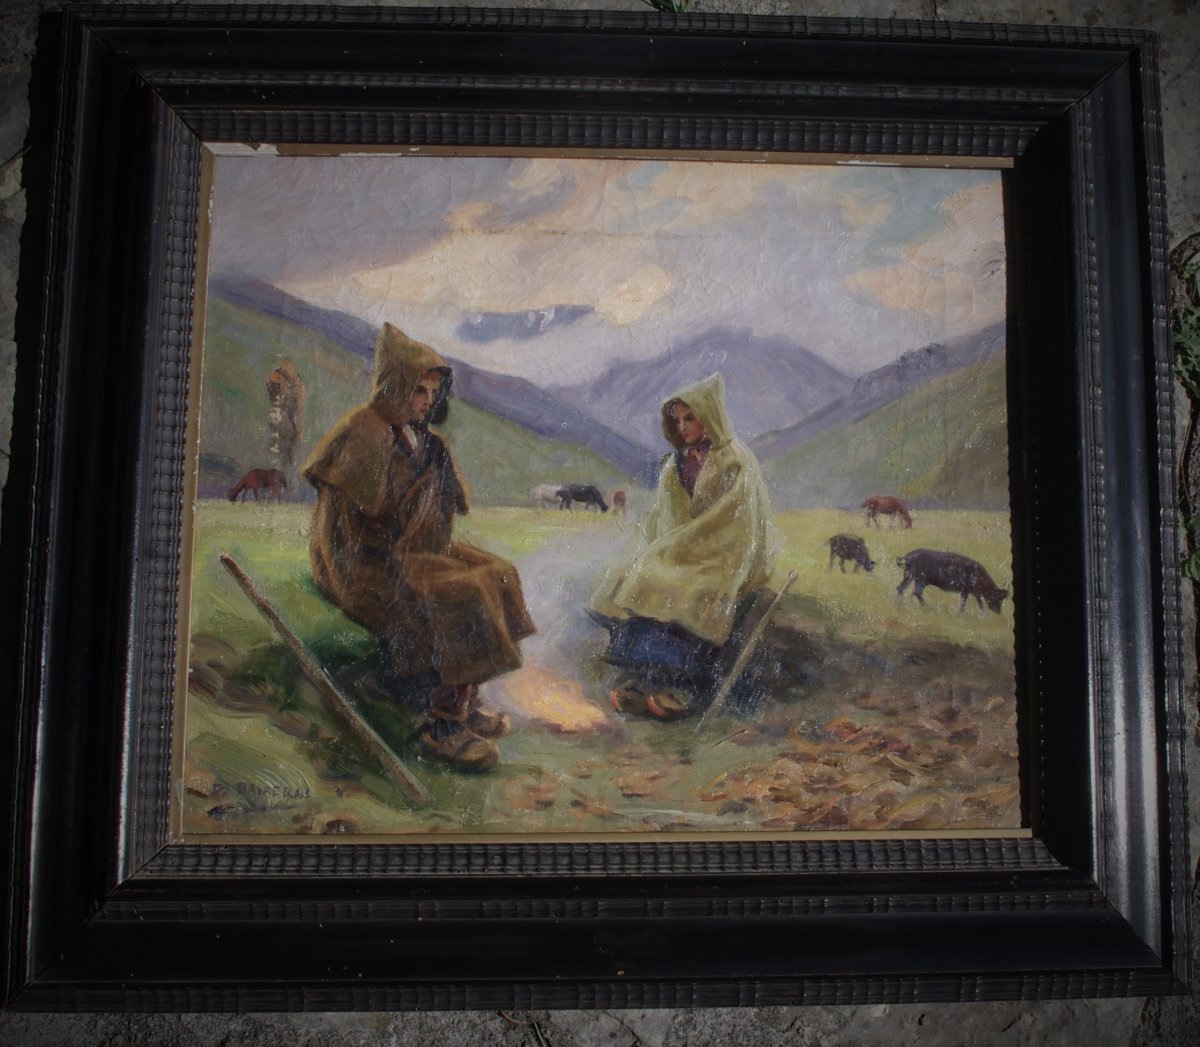 Dionisio Baixeras Verdaguer, 1862 1943 Catalan Spain, The Shepherds Near The Fire In The Mountain